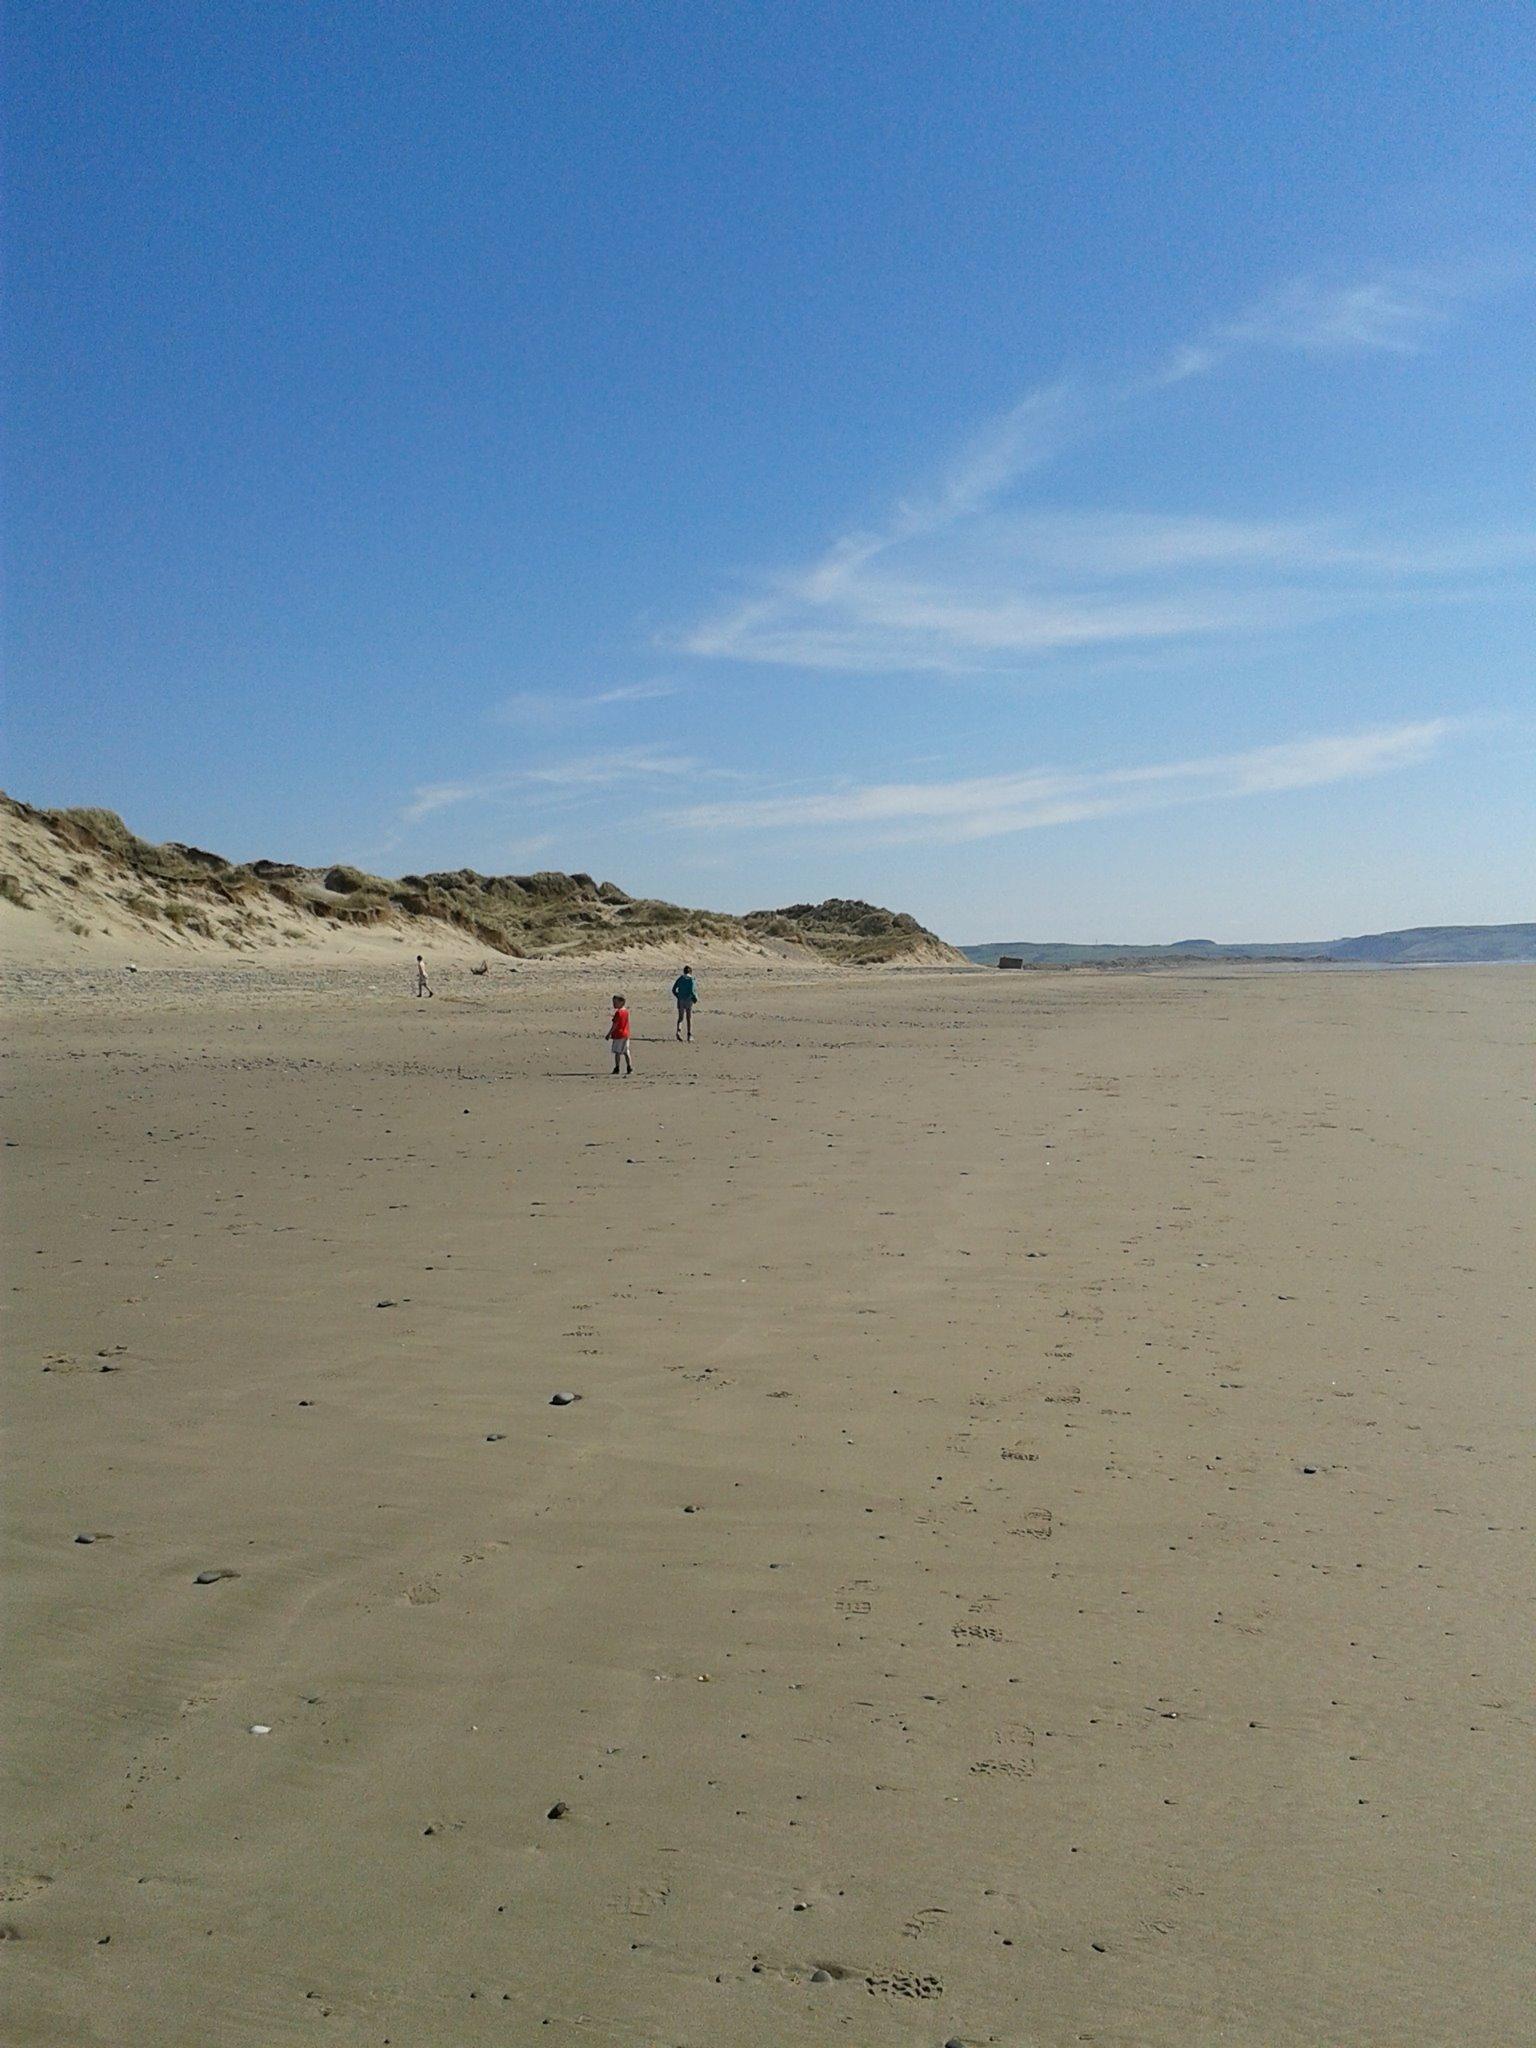 Aberdyfi Beach and dunes